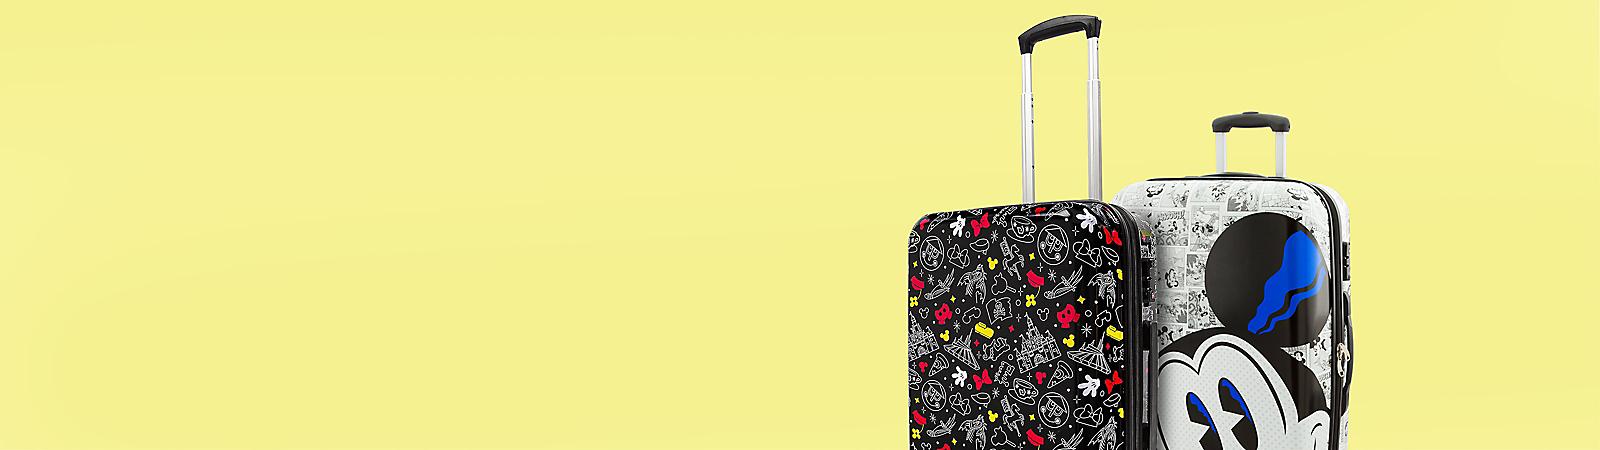 Men's Luggage & Travel